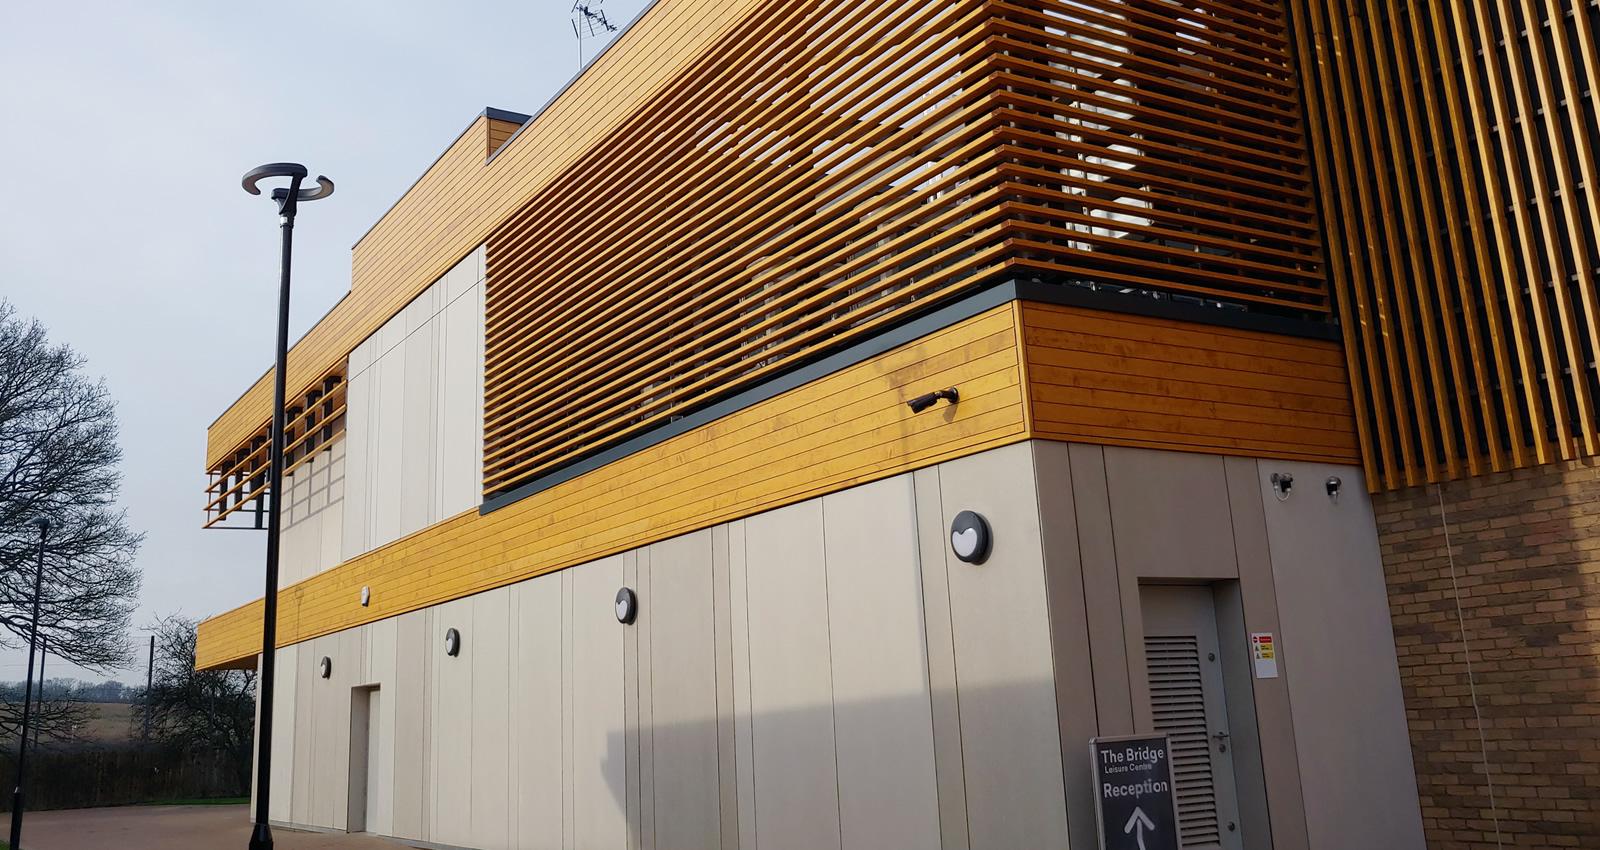 Broadbridge Leisure Centre